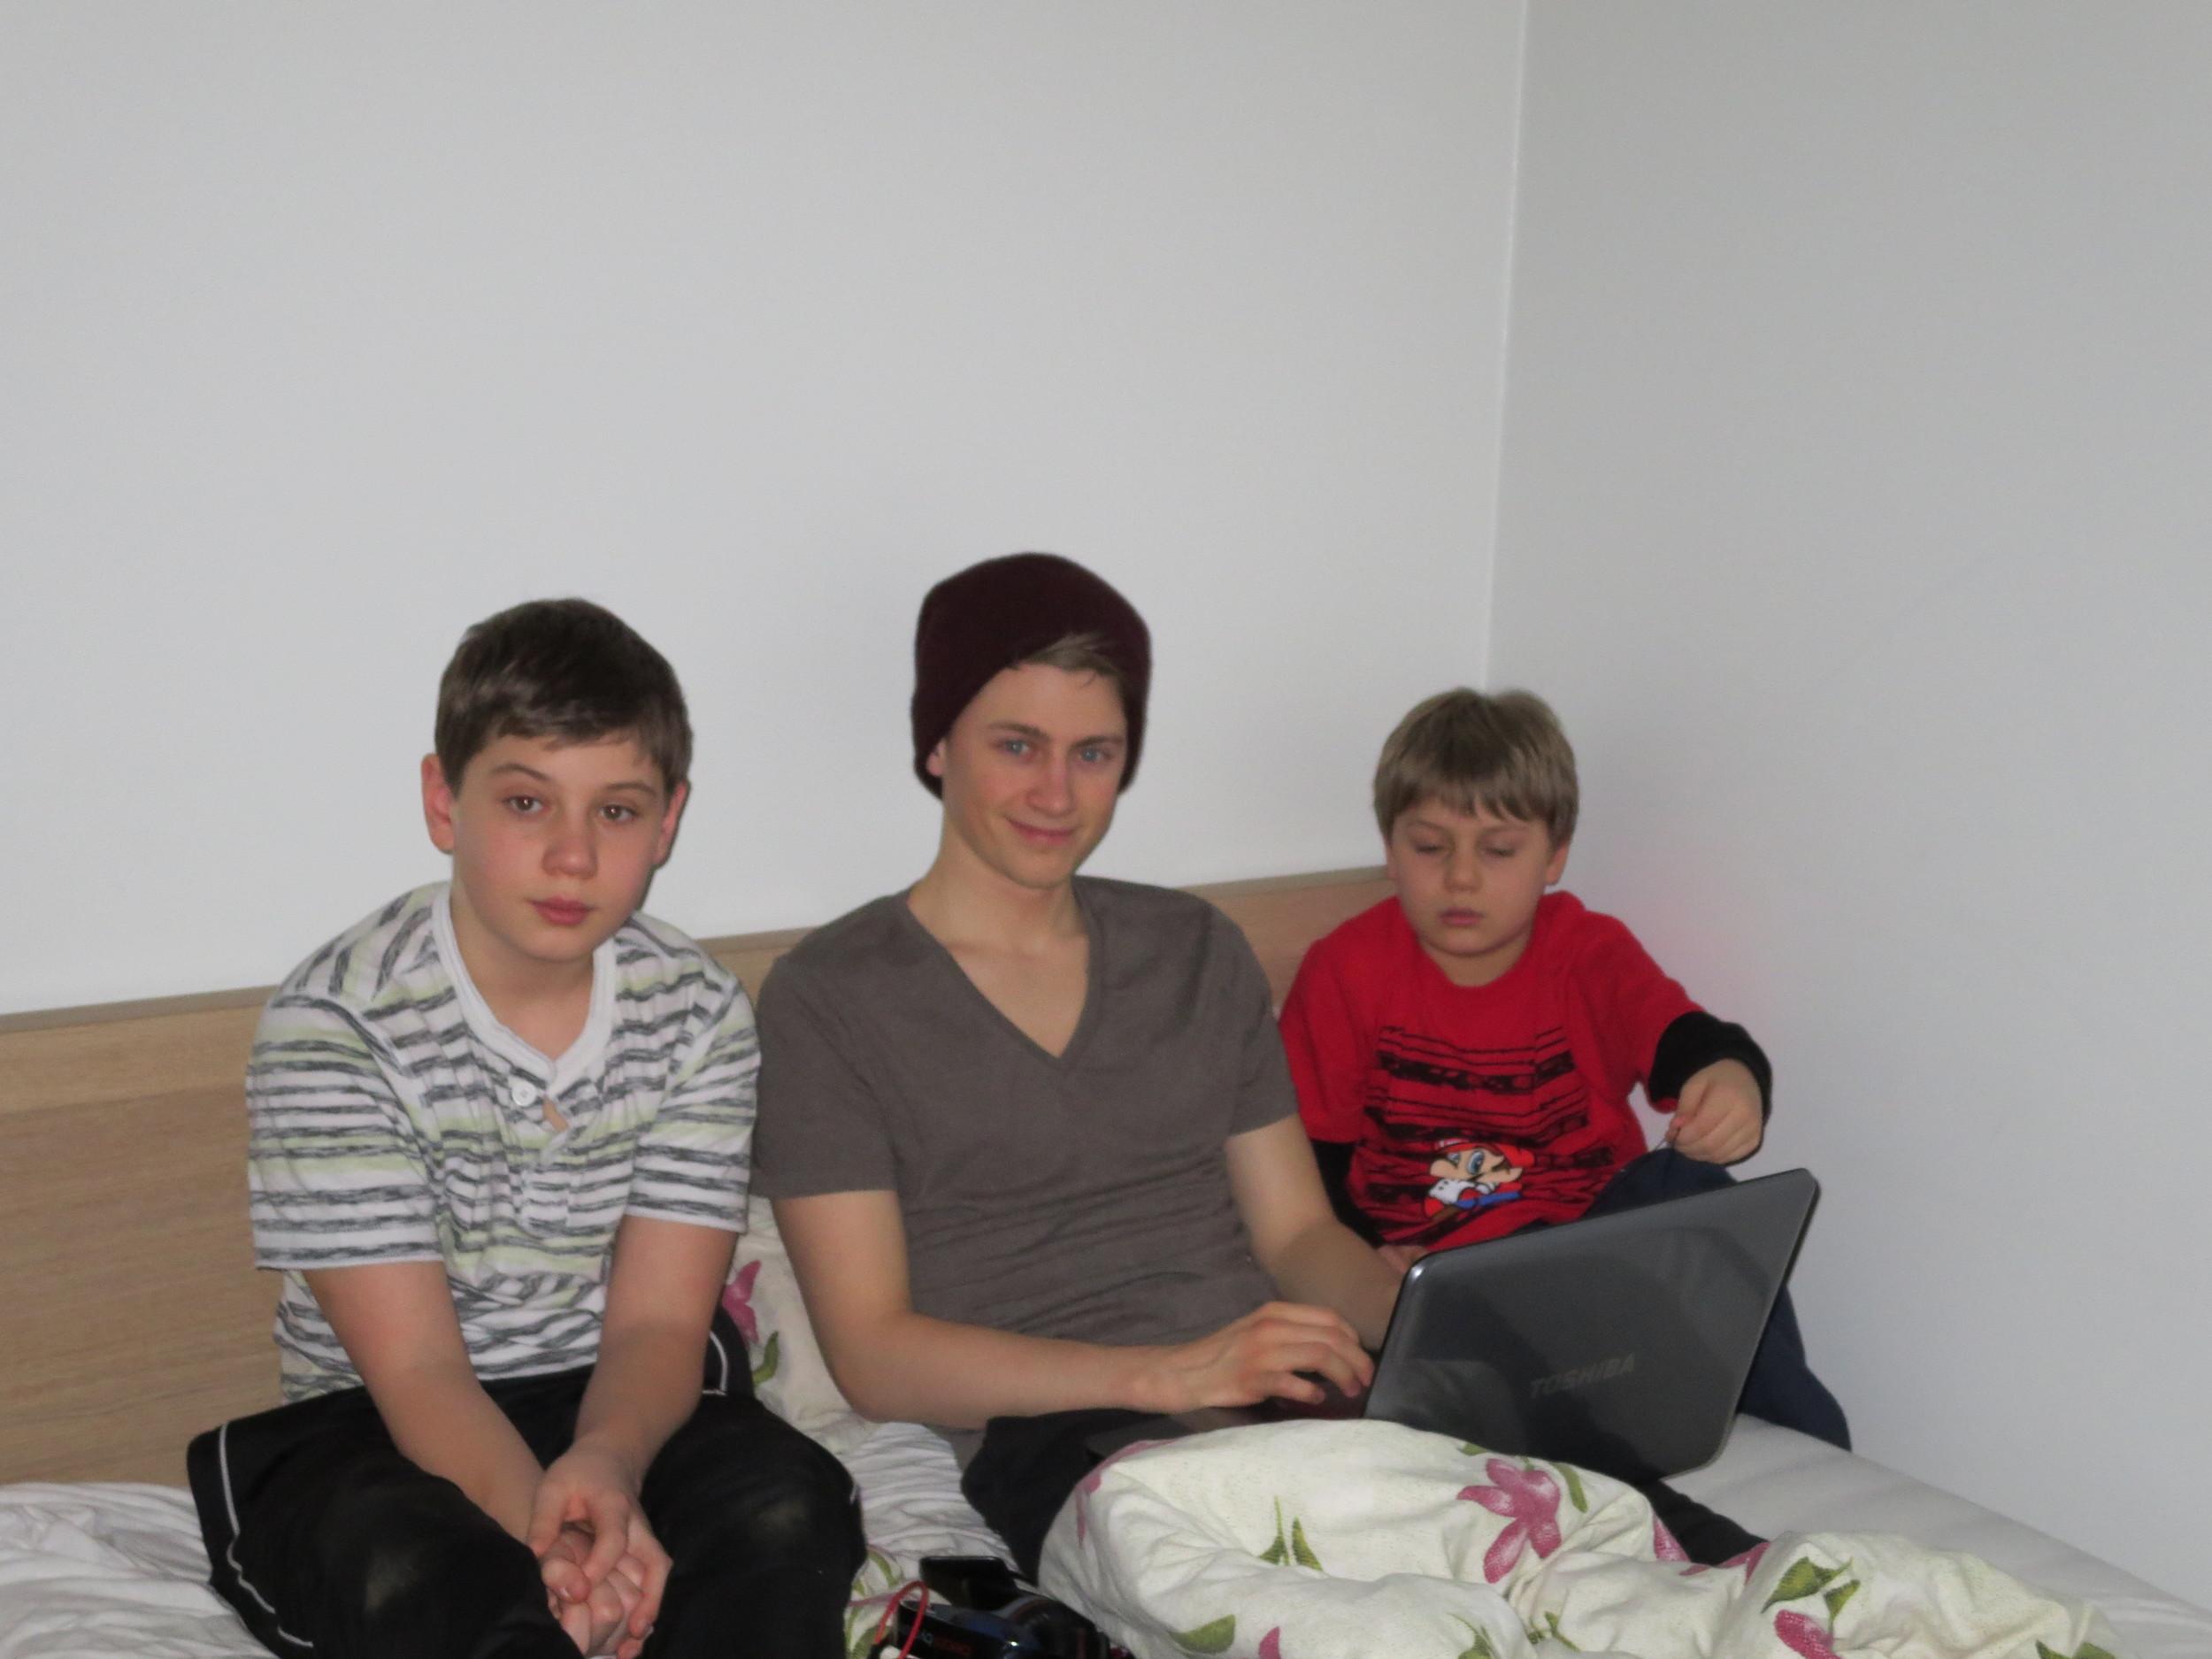 Atli relaxing with his nephews, Adam and Sami